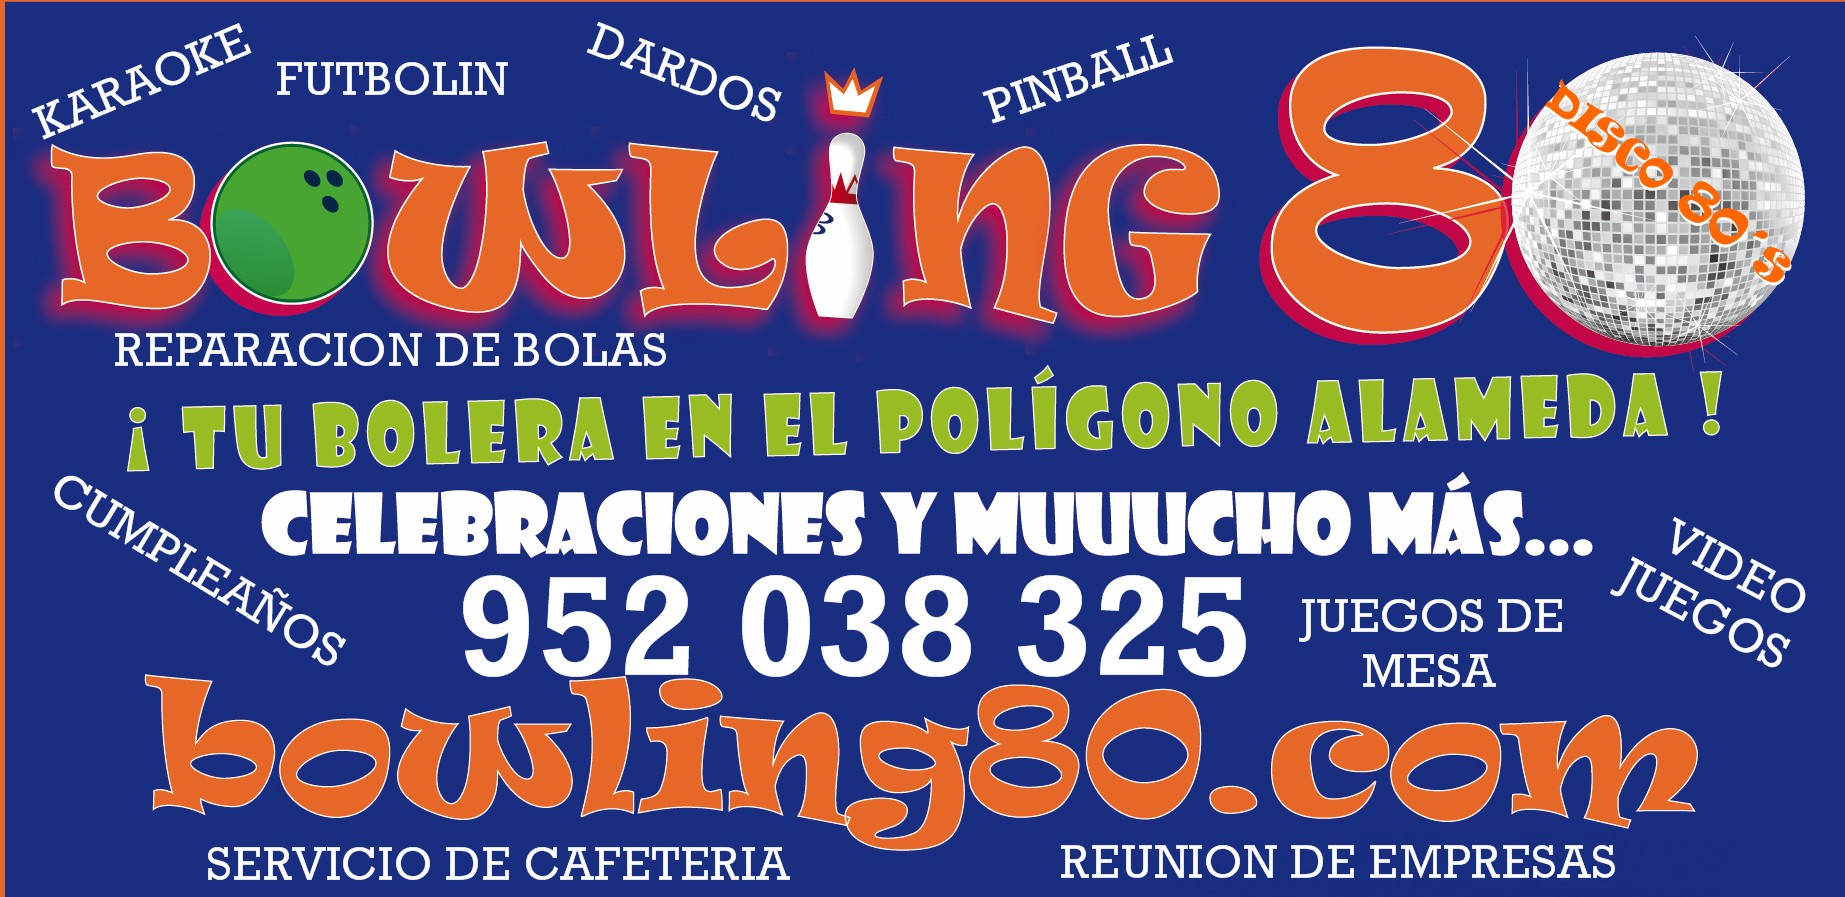 Bowling 80